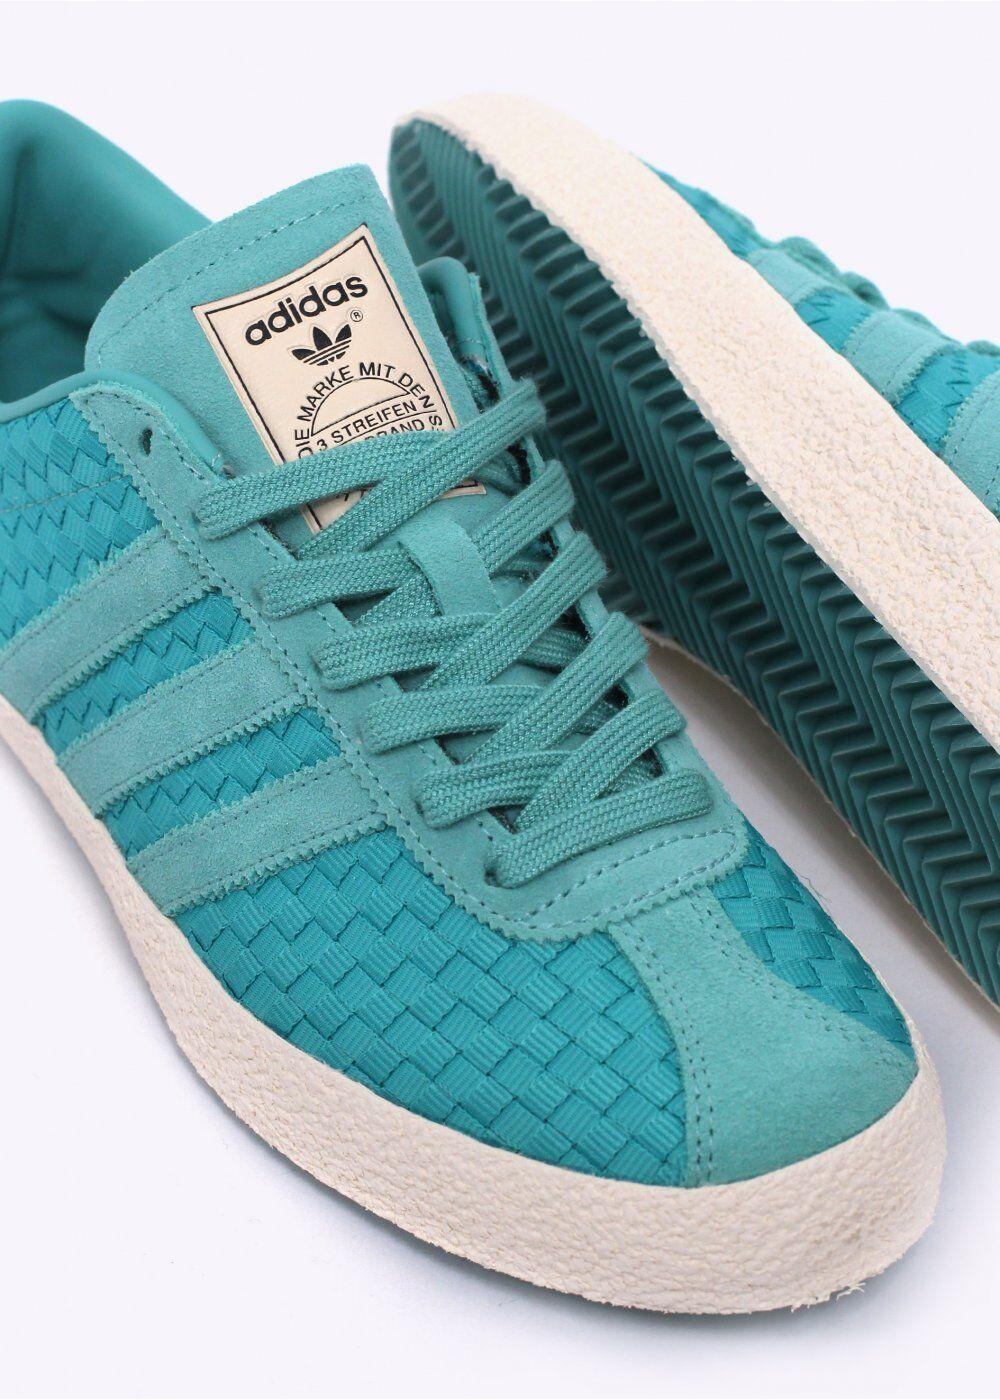 Adidas Originals Gazelle 70s M19620